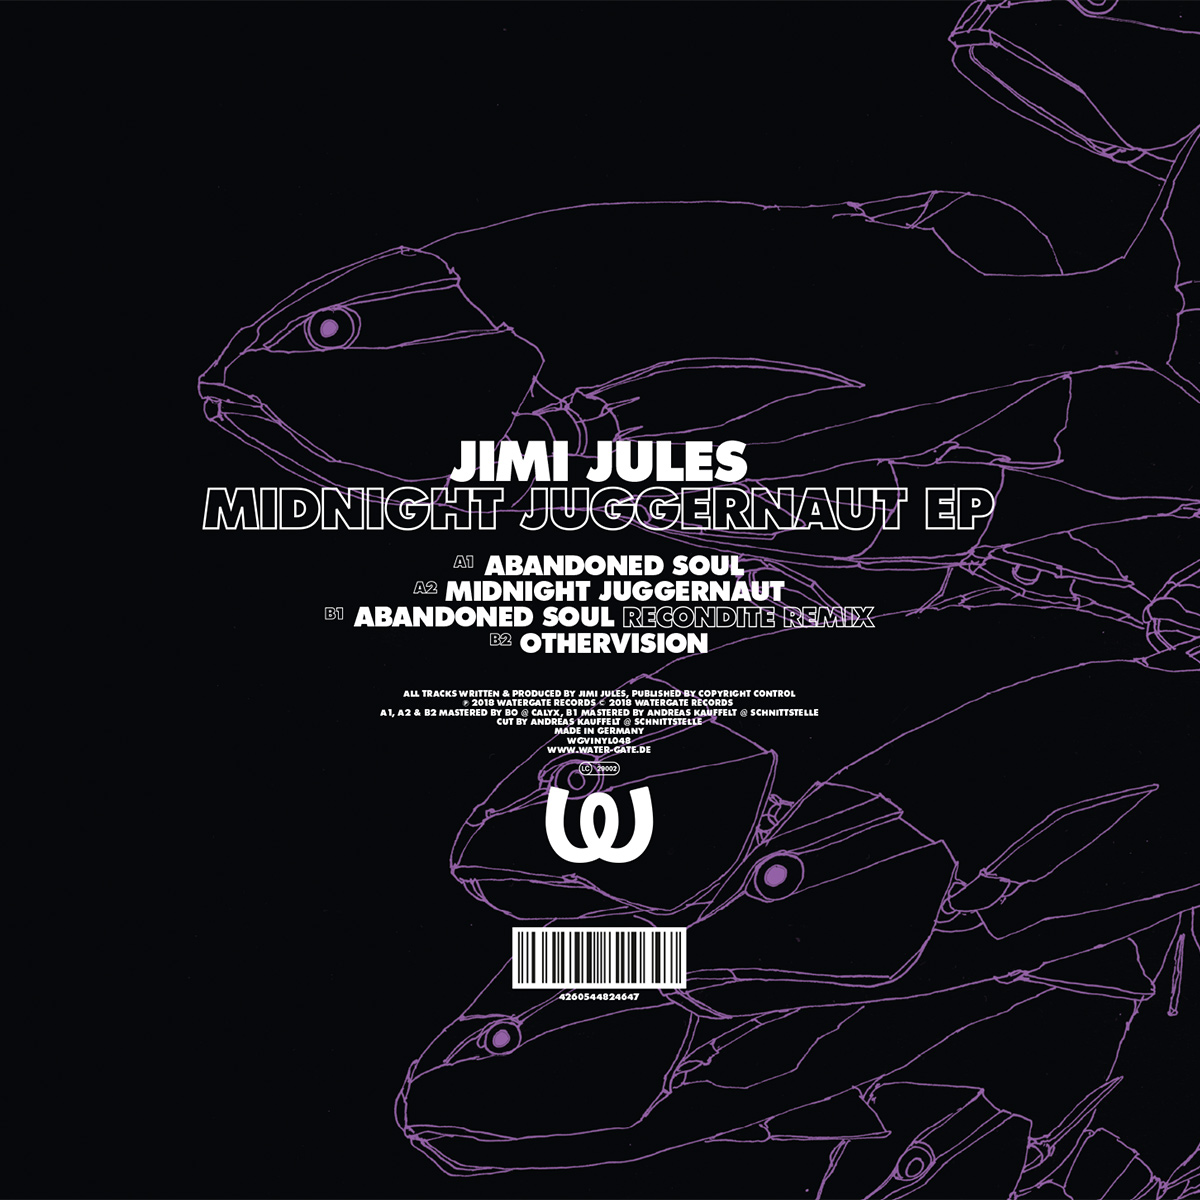 Jimi Jules Midnight Juggernaut EP